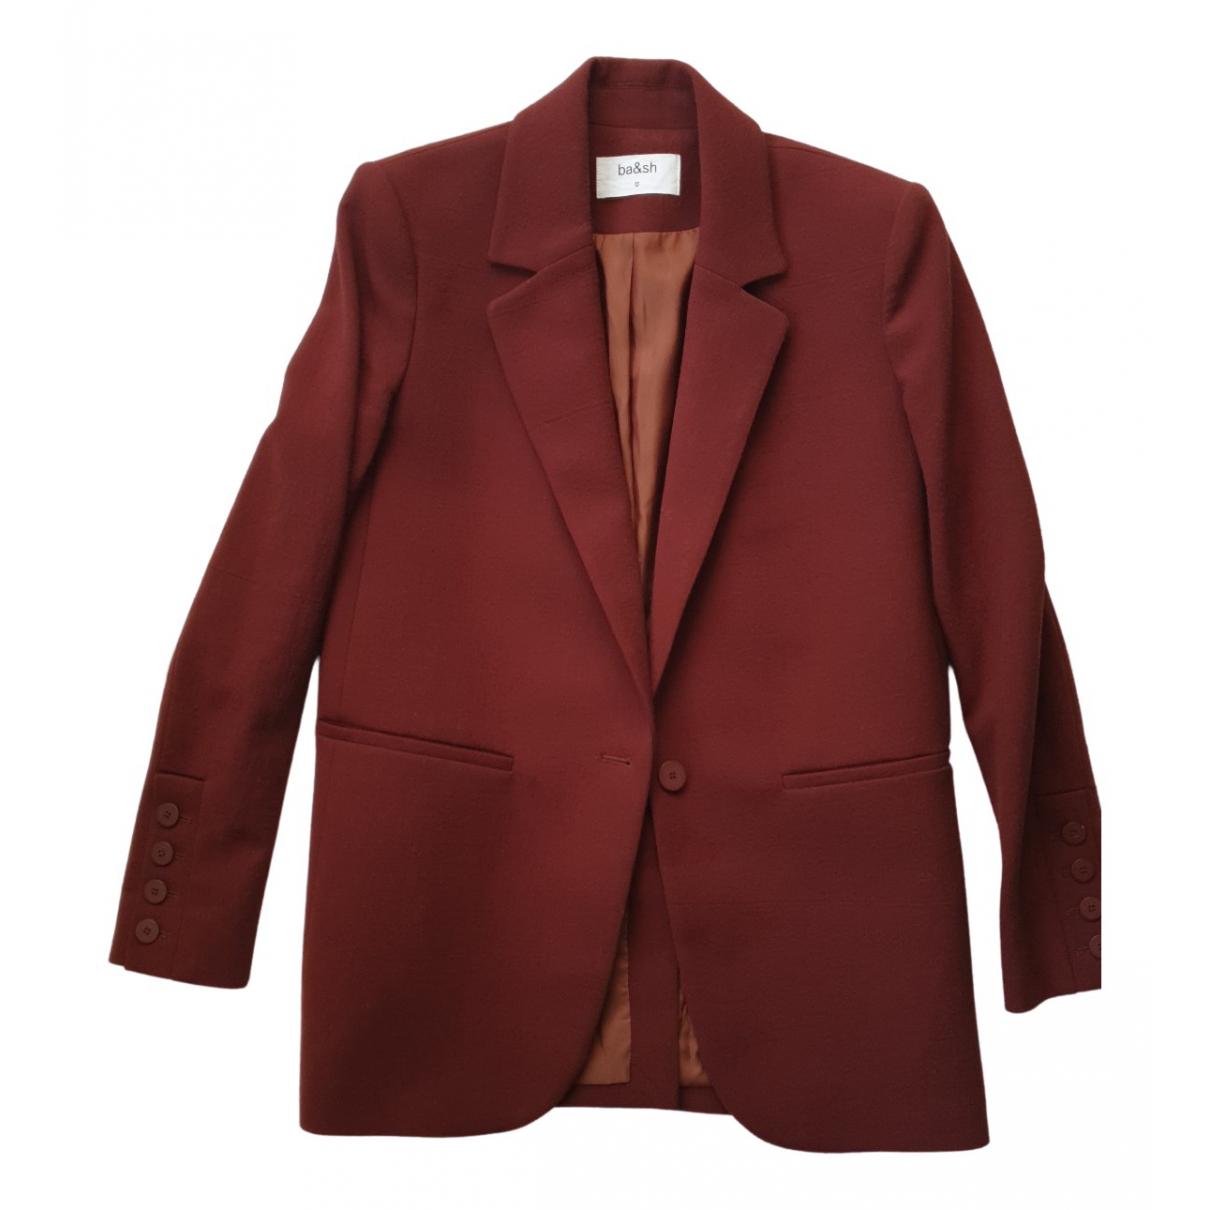 Ba&sh Fall Winter 2019 Brown jacket for Women 34 FR